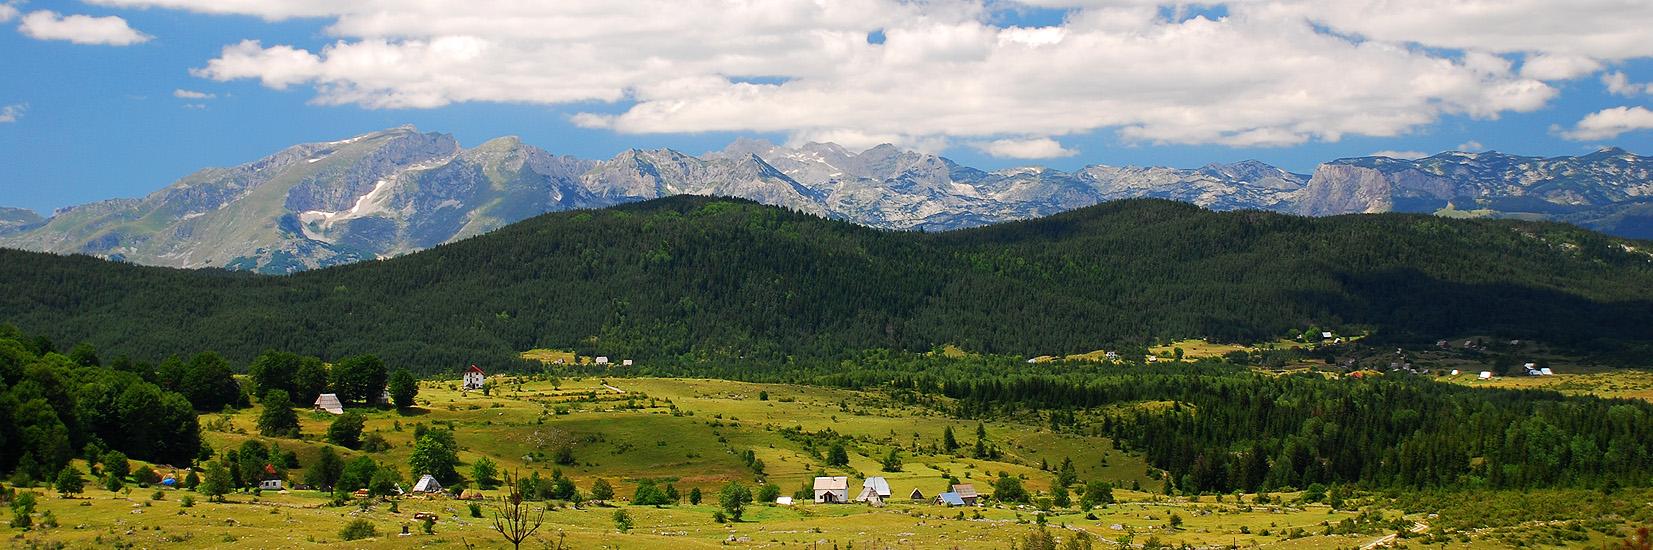 Foto: summitpost.org